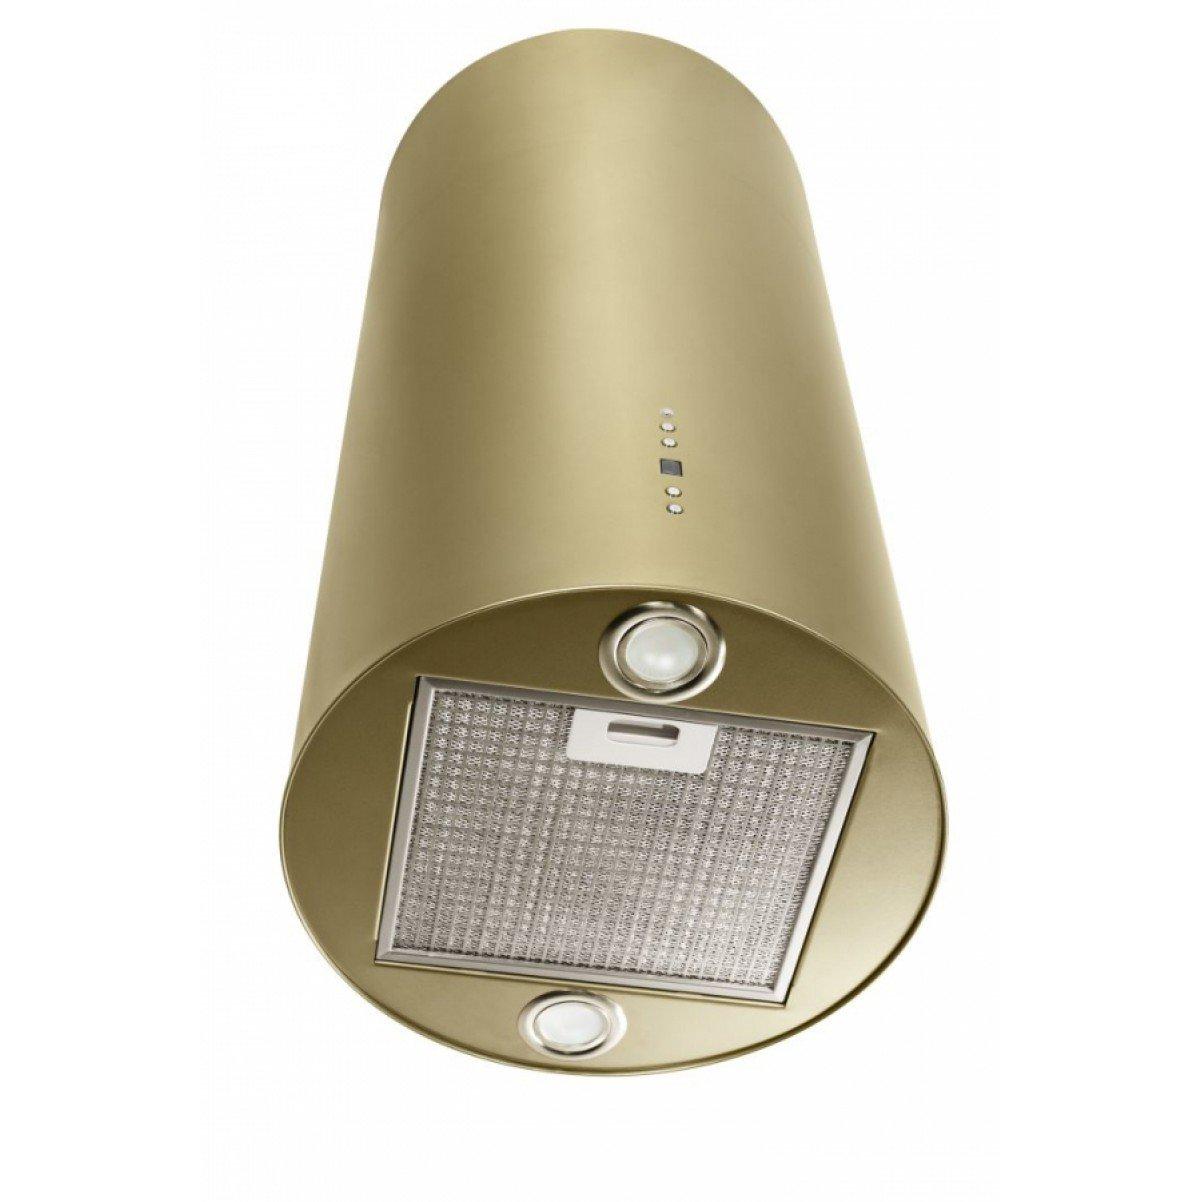 Design frihängande cylinderformad köksfläkt Explorer guld